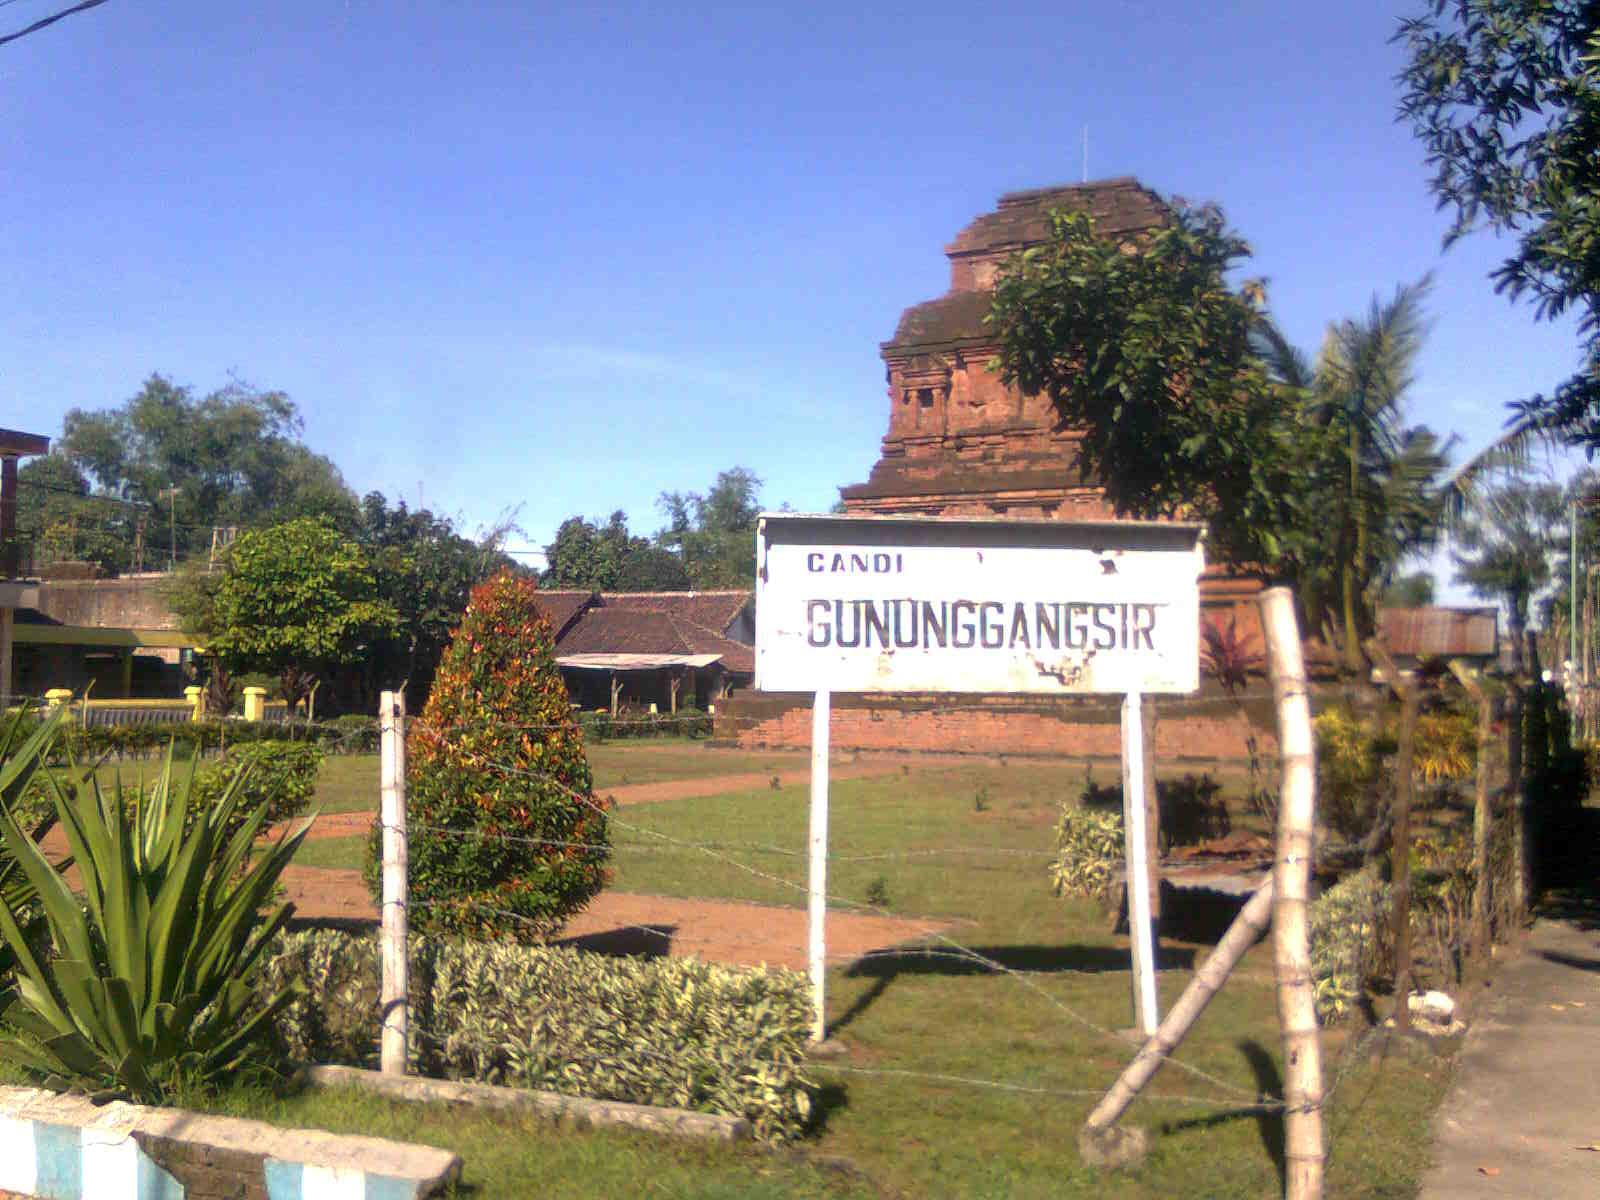 Mengenal Candi Gunung Gangsir Kab Pasuruan